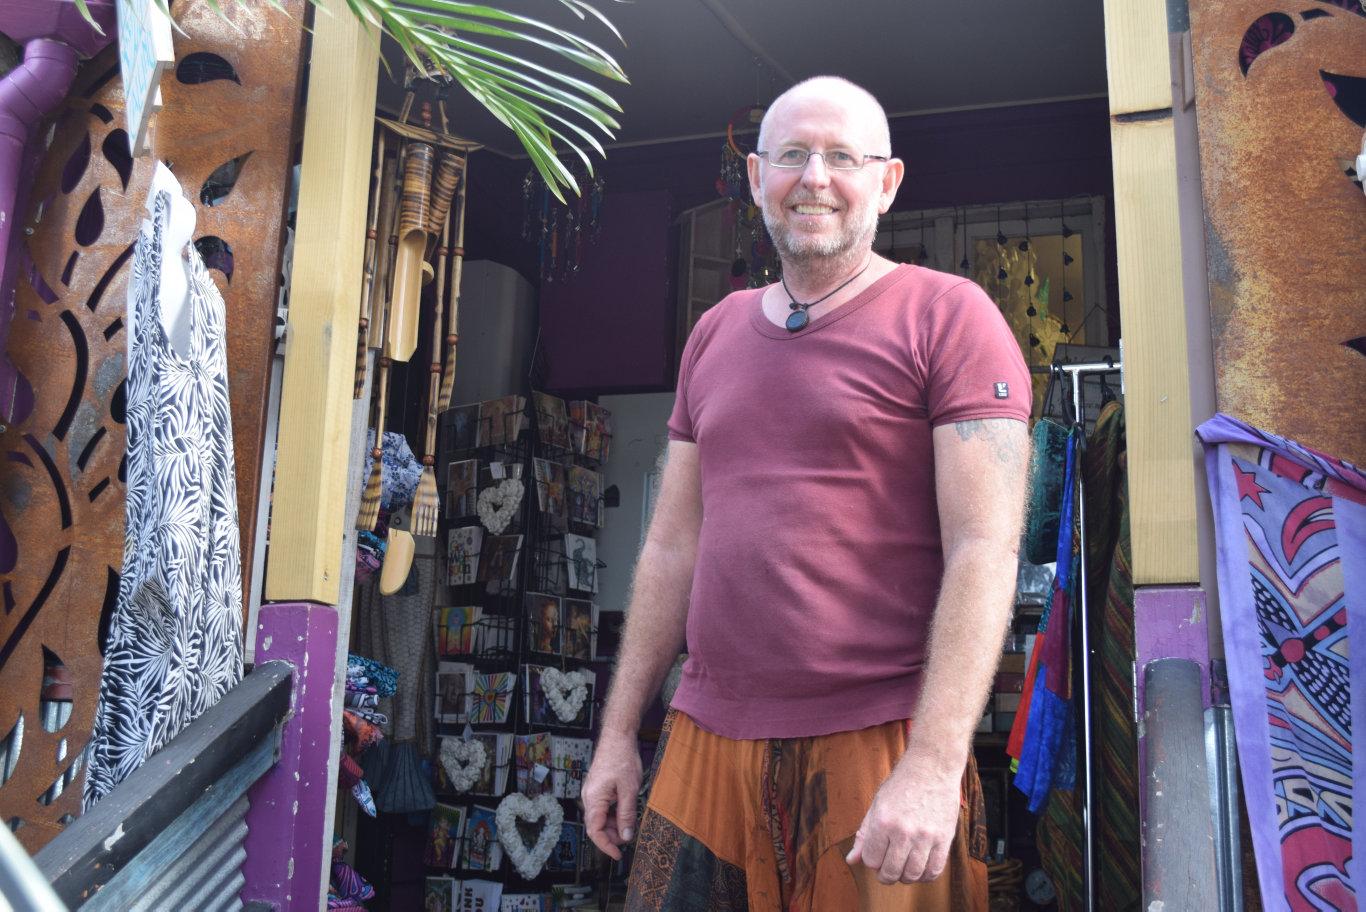 TIARO BUSINESSES: Owner of Hippie Garage in Tiaro, Corey Pickett. Photo: Stuart Fast